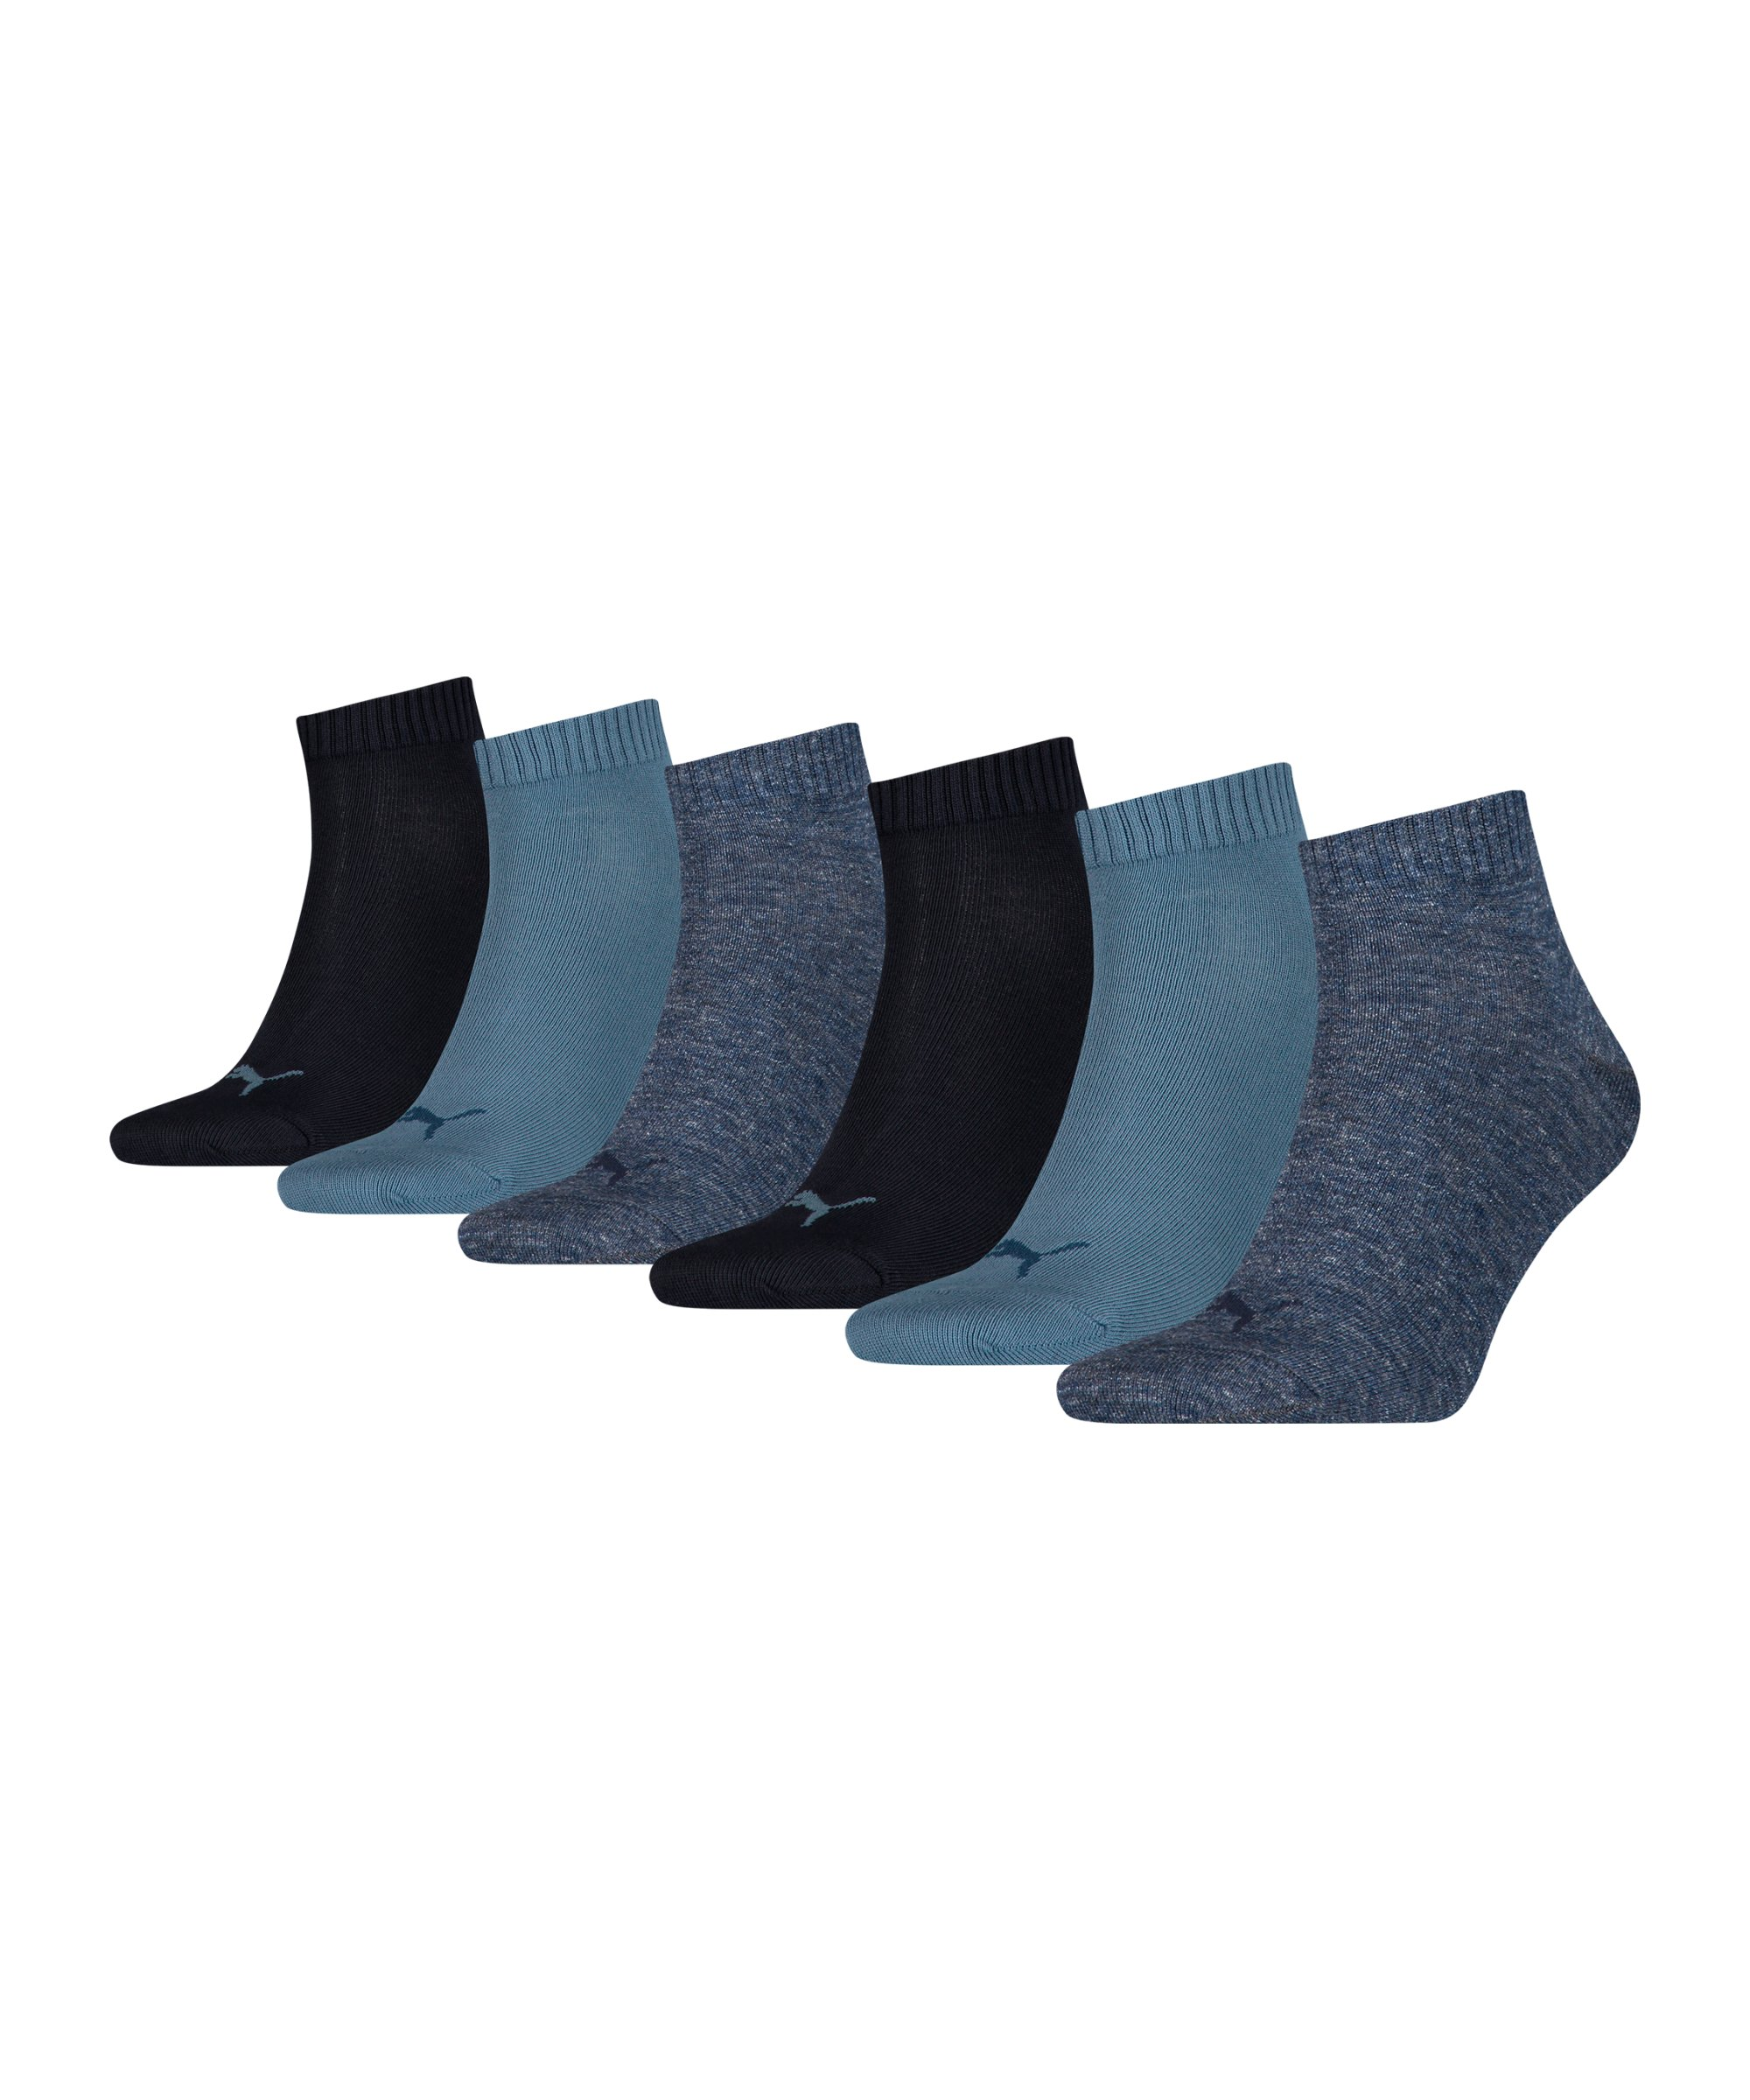 PUMA Unisex Quarter Plain 6er Pack Socken F004 - blau